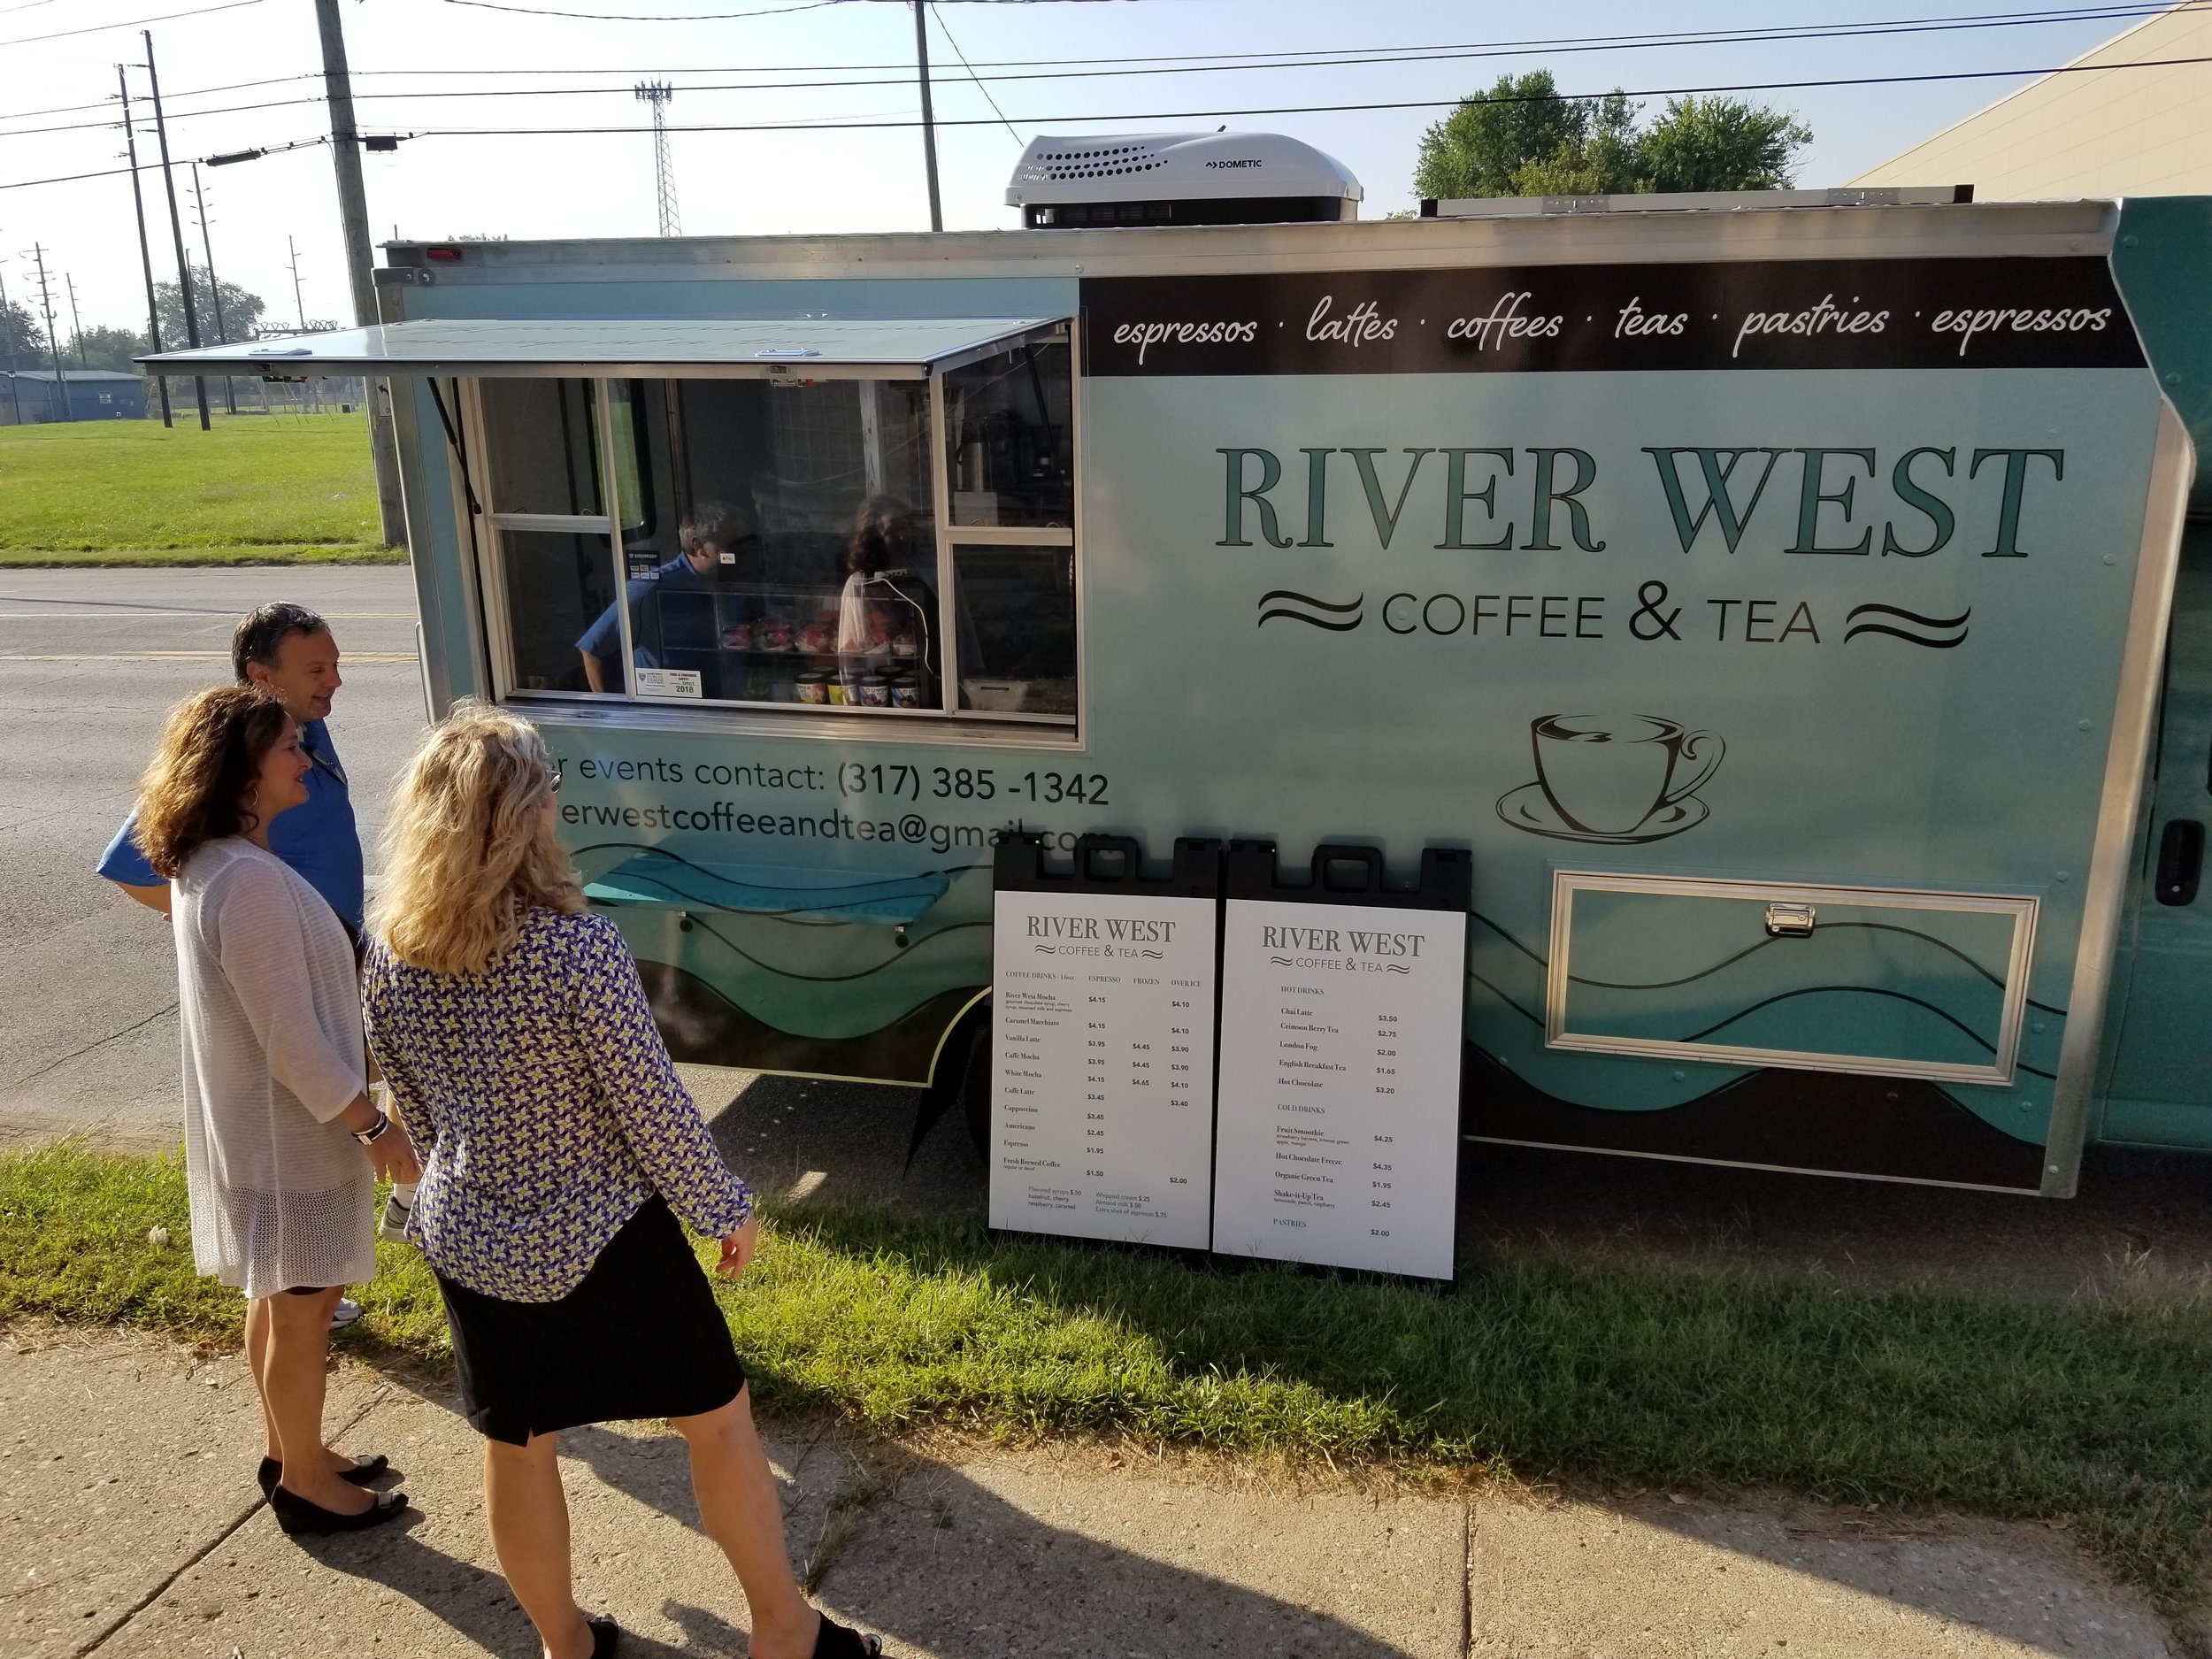 River West Coffee & Tea Owner, Bogdan Zgirta, talks with Near West customers.